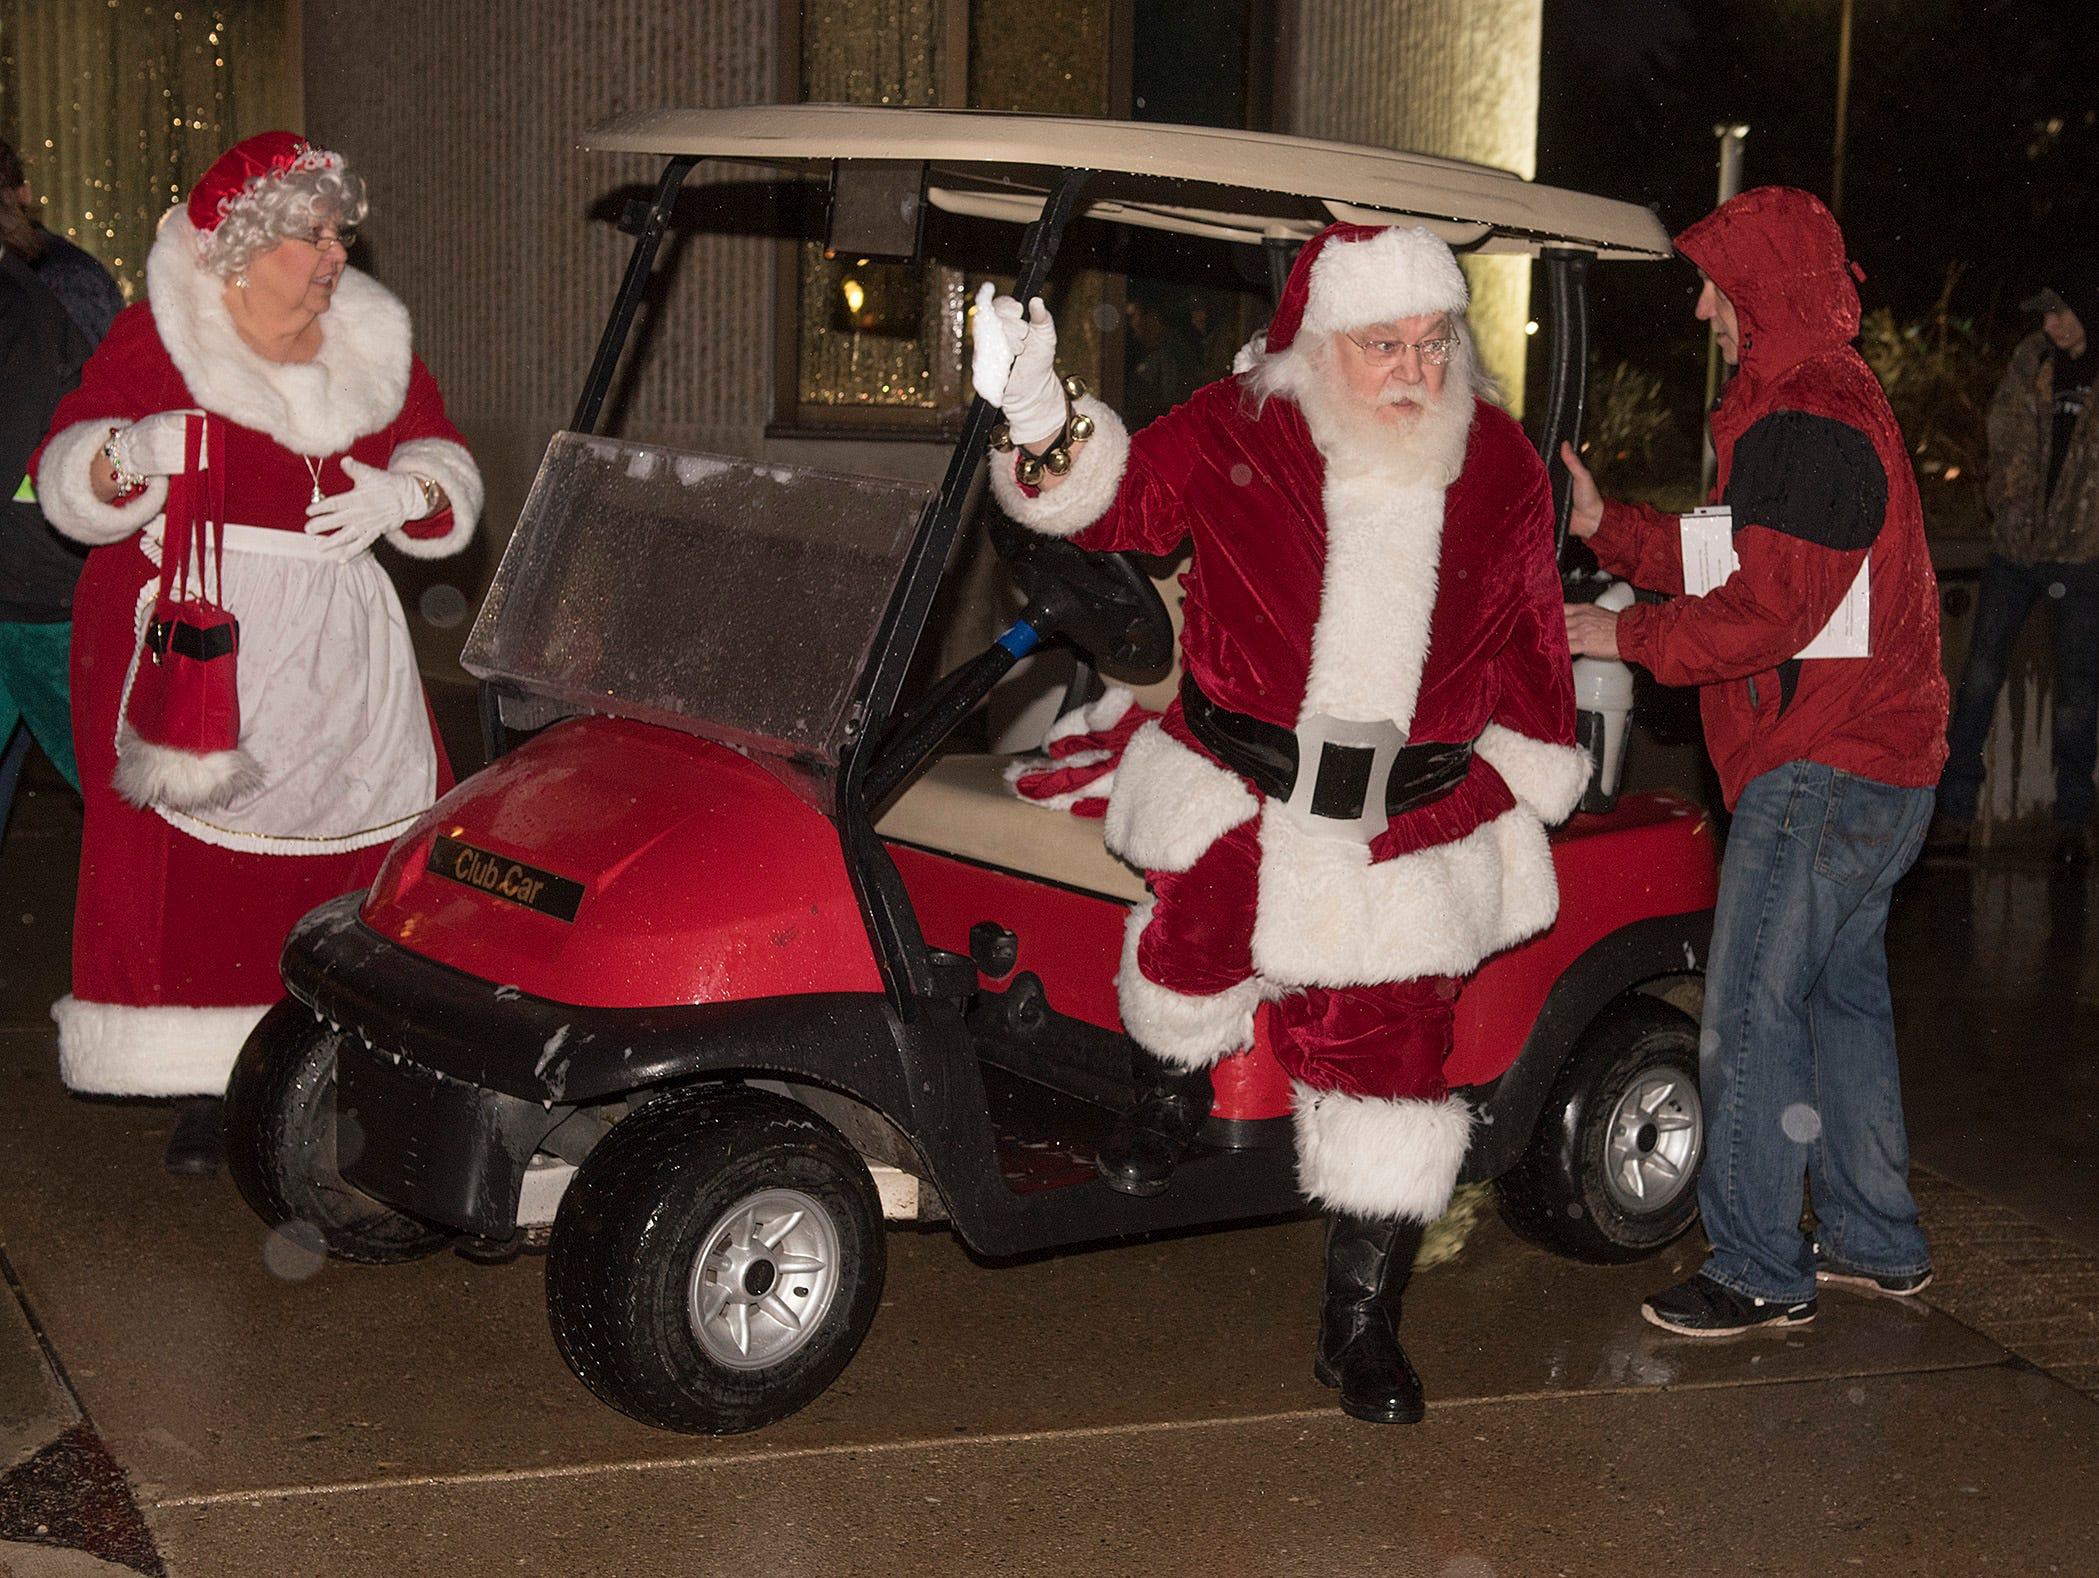 Santa and Mrs. Claus make their final approach in a Santa Claus red golf cart.